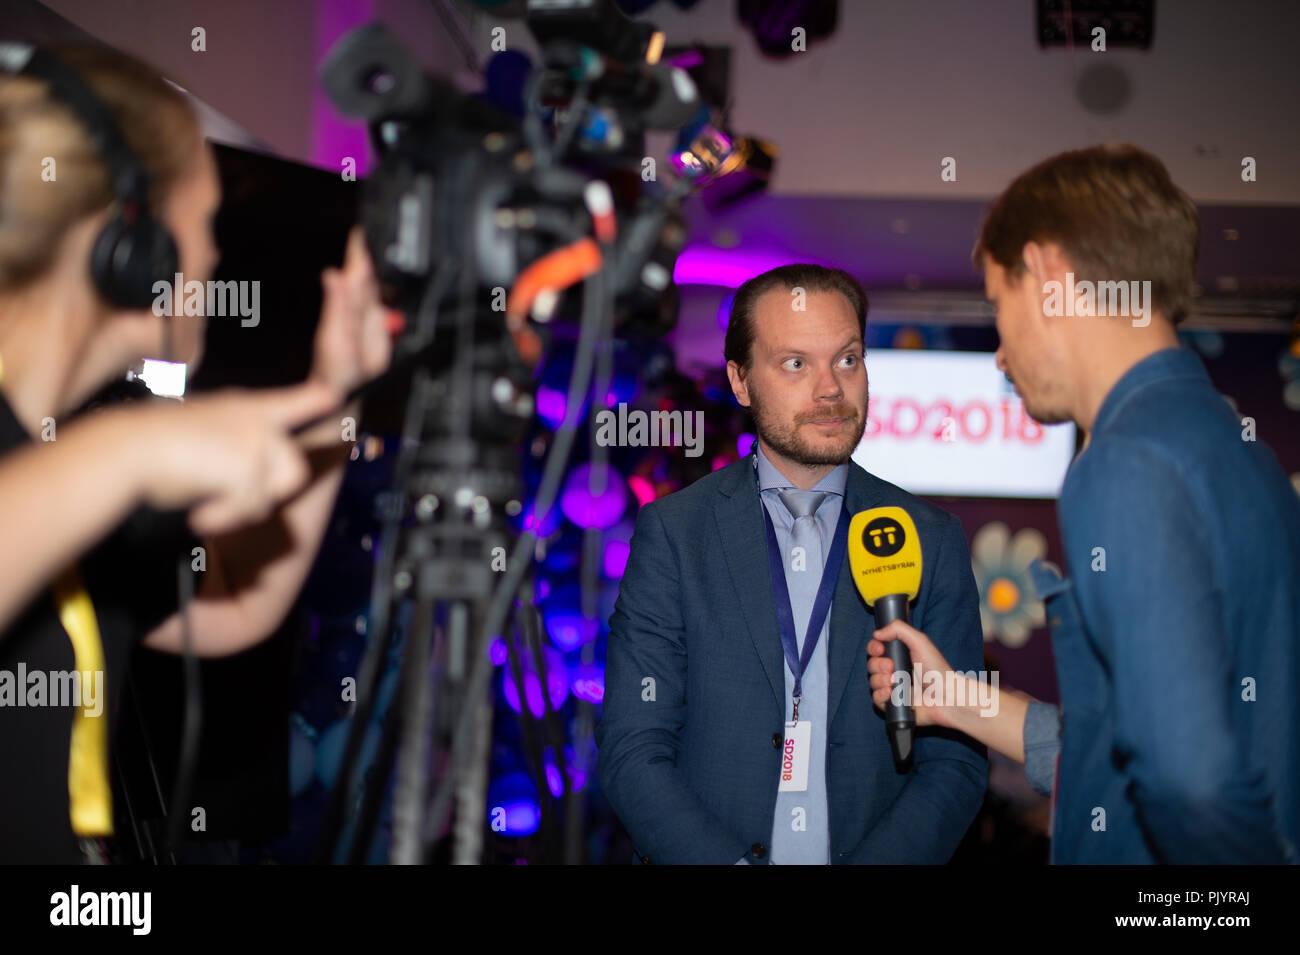 Stockholm, Sweden, September 9, 2018. Swedish General Election 2018.  Election Night Watch Party for Sweden Democrats (SD) in central Stockholm, Sweden. Martin Kinnunen (SD). Credit: Barbro Bergfeldt/Alamy Live News Stock Photo